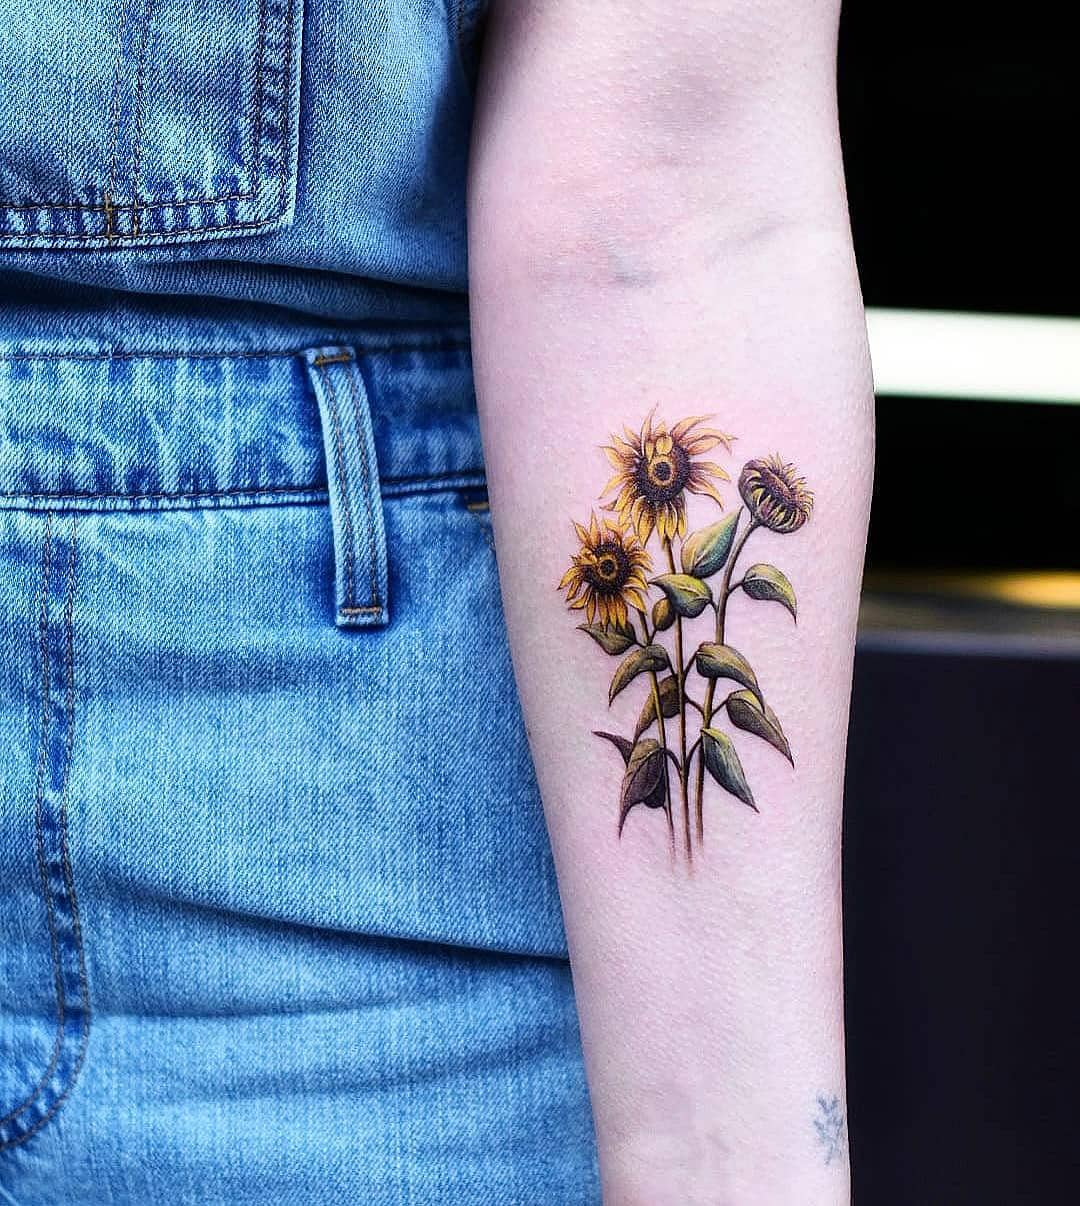 girasoli tattoo by @bangbangnyc